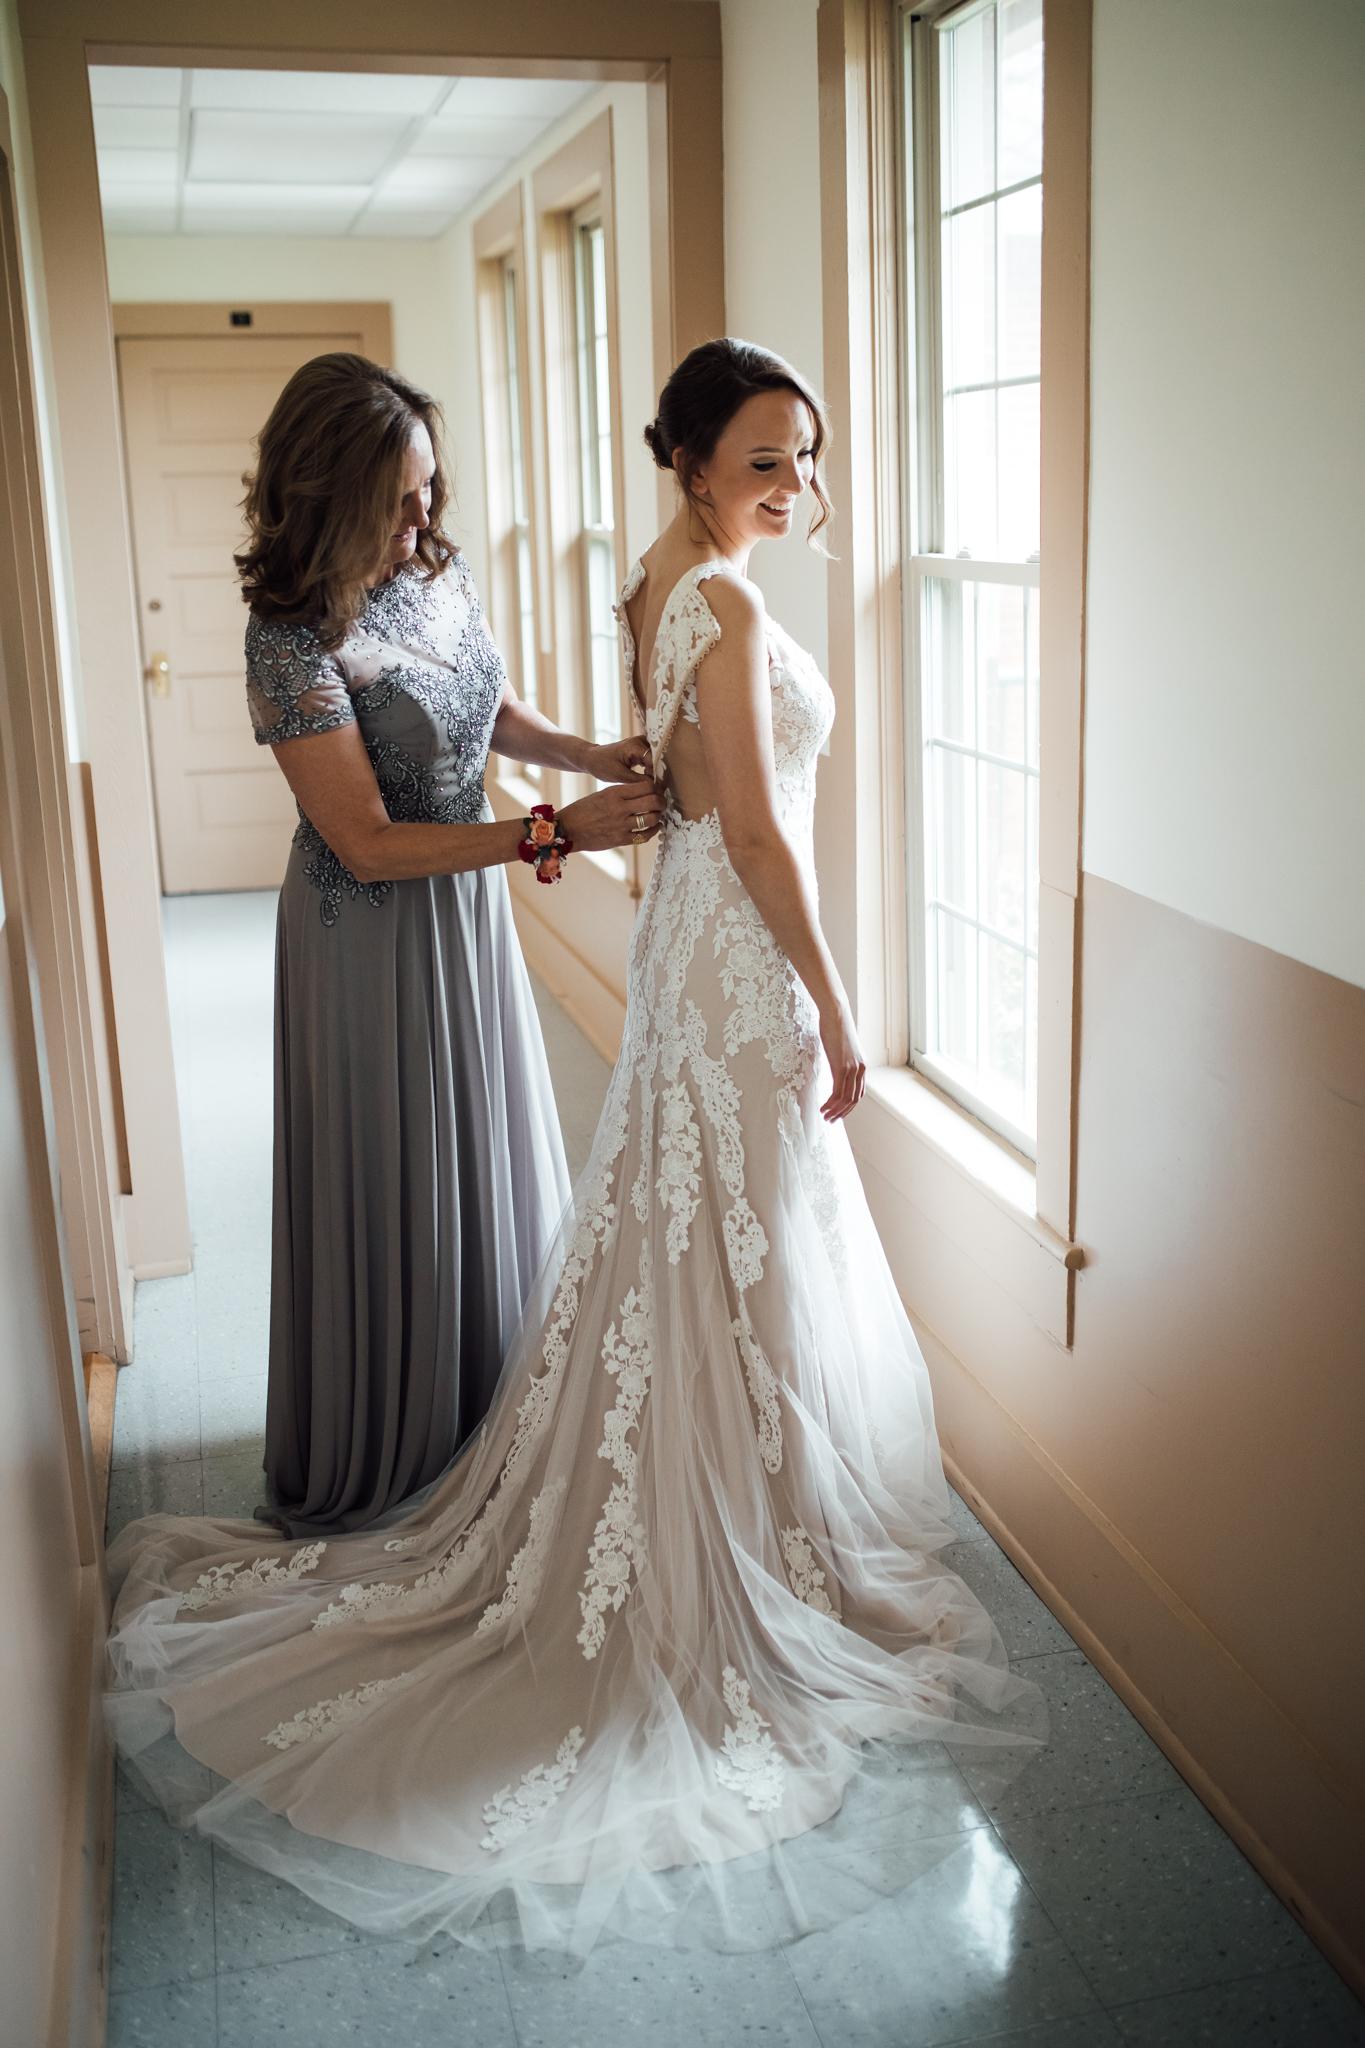 birmingham-alabama-wedding-photographer-laura-terry-the-warmth-around-you (25 of 110).jpg